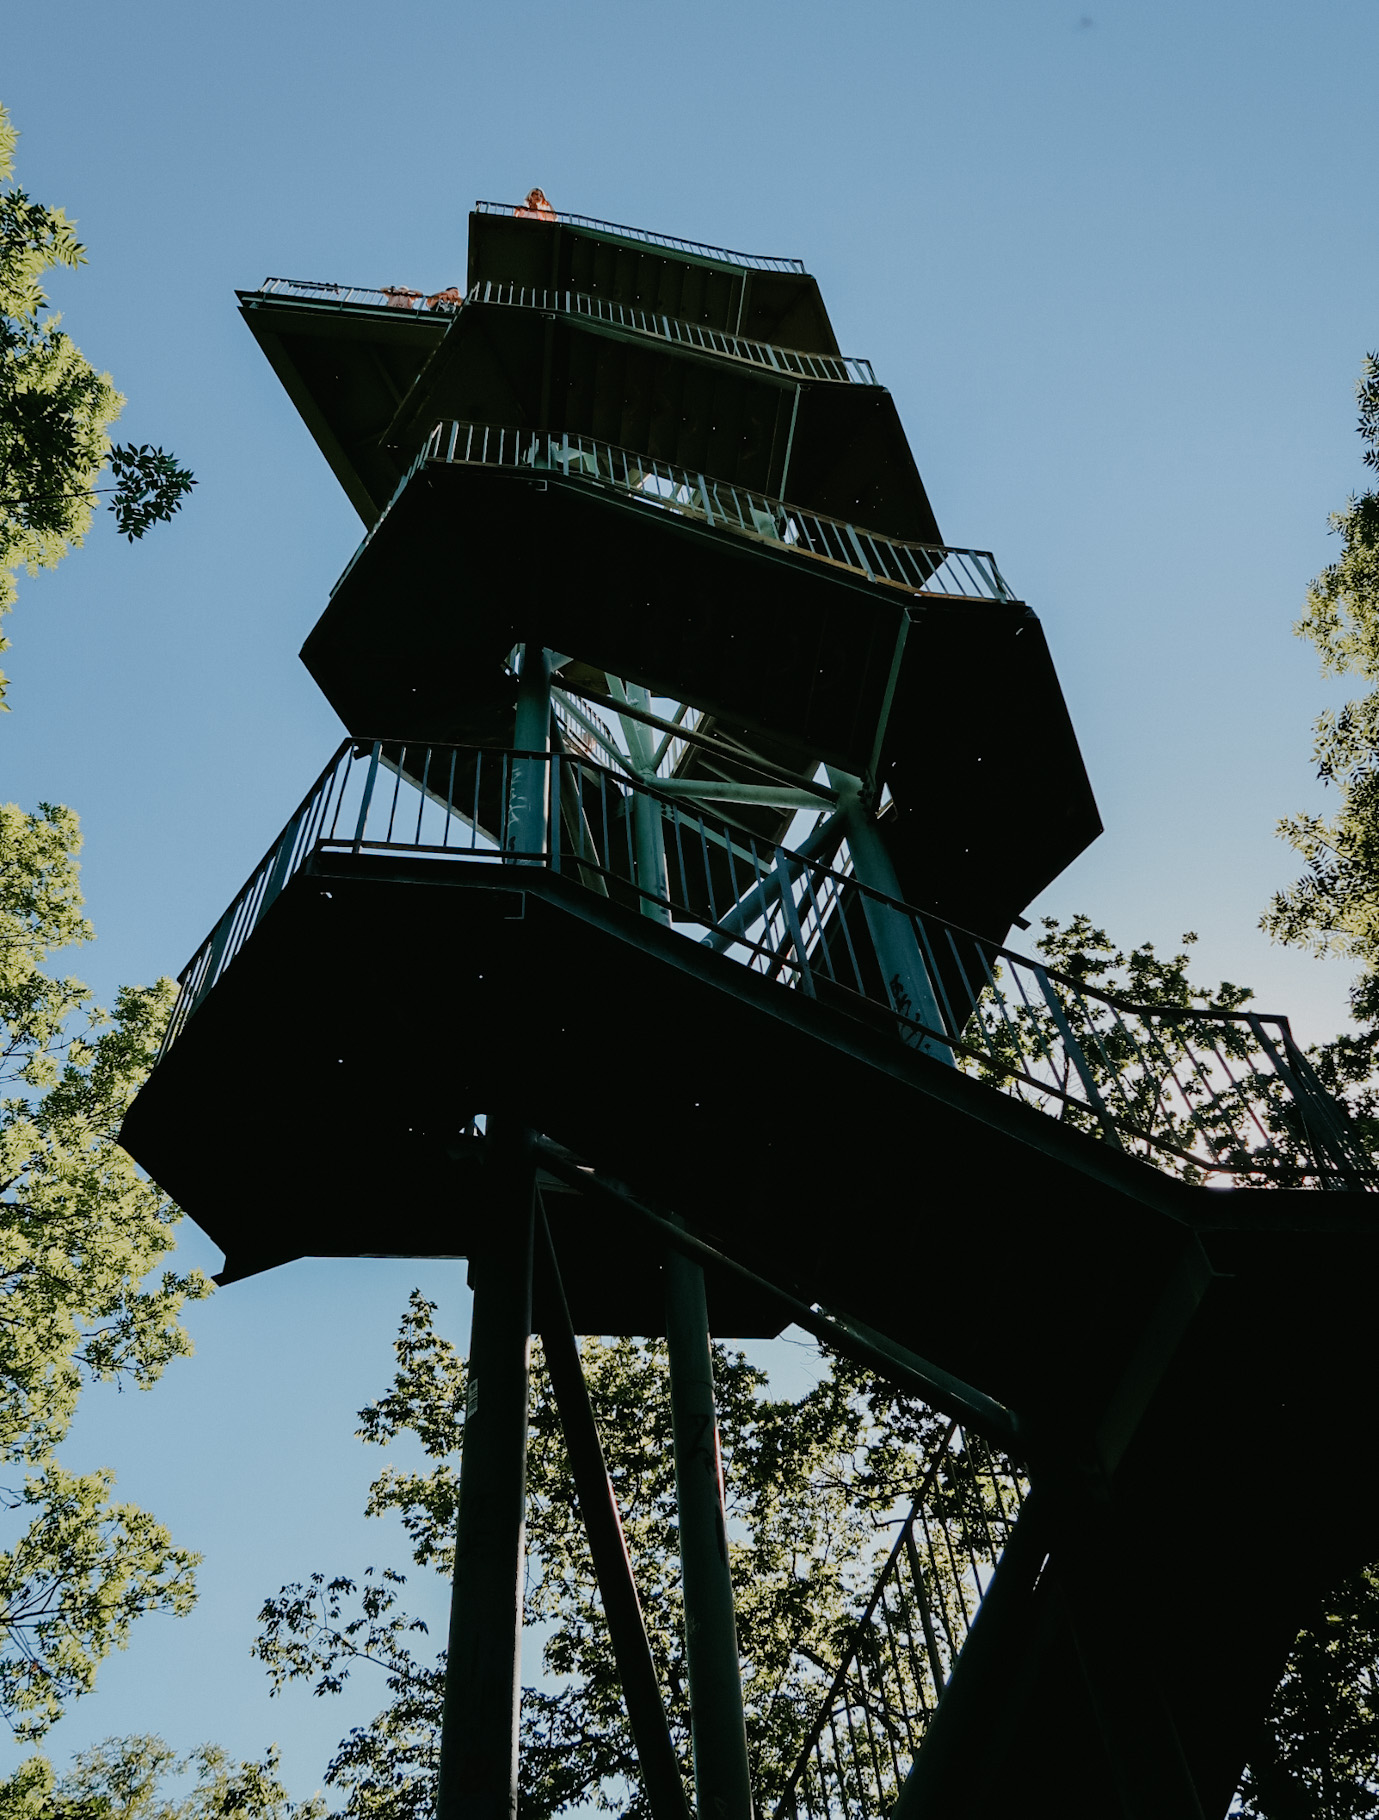 wackelturm-leipzig-bucketlist-blog